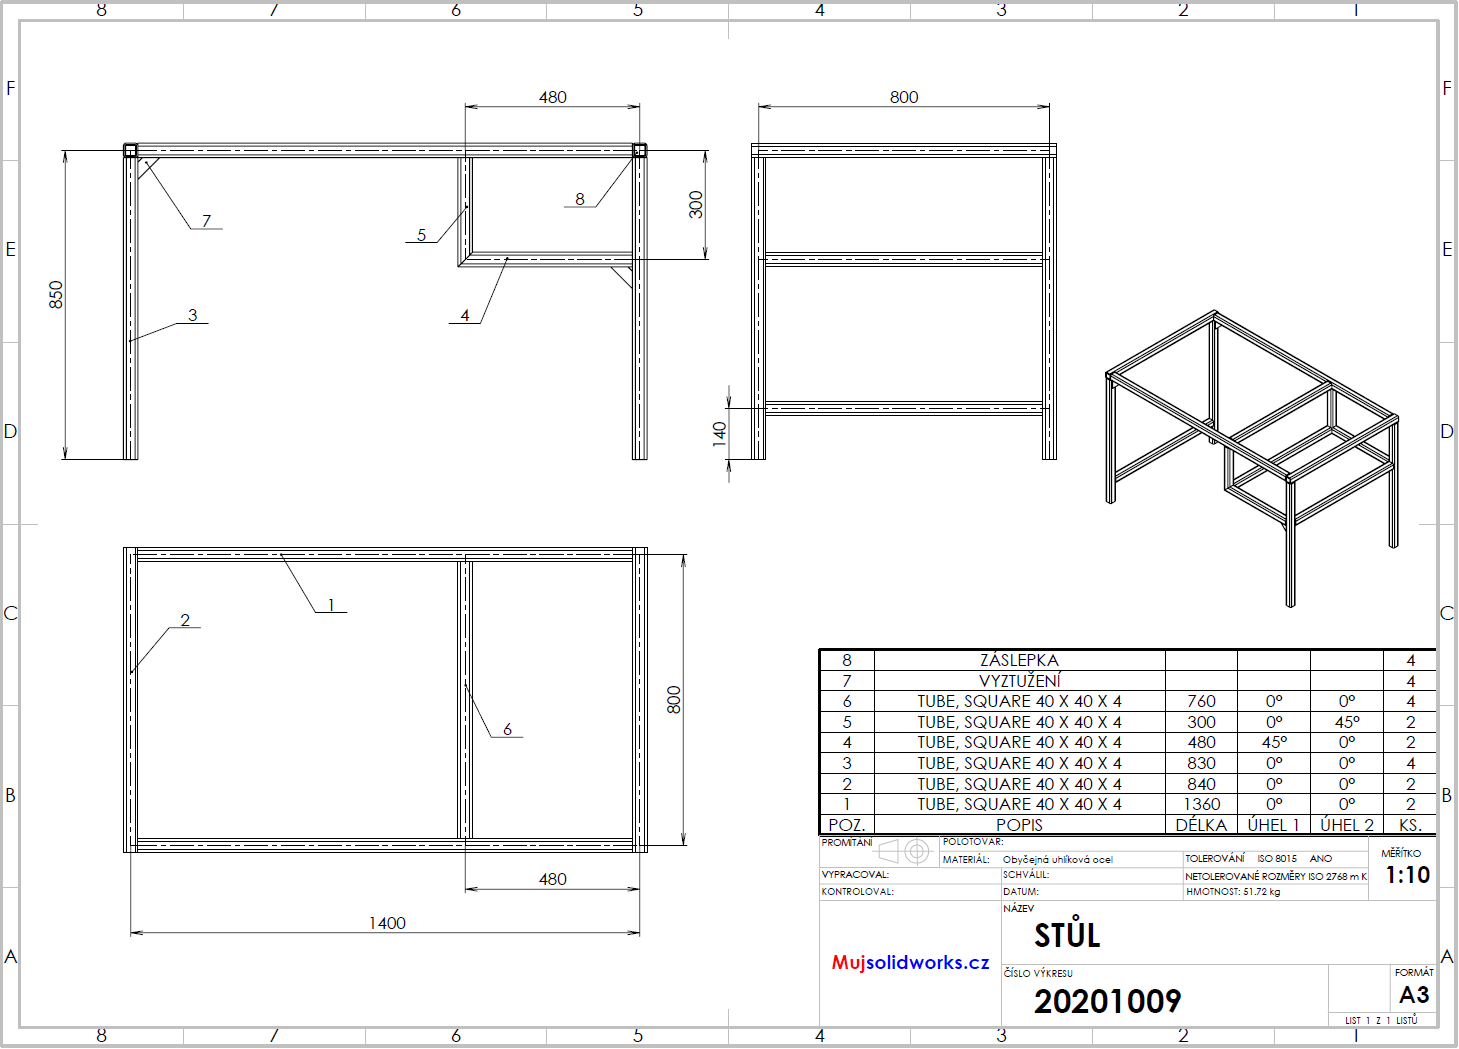 301-welding-svarovani-SolidWorks-postup-tutorial-navod-zaciname-ucime-se